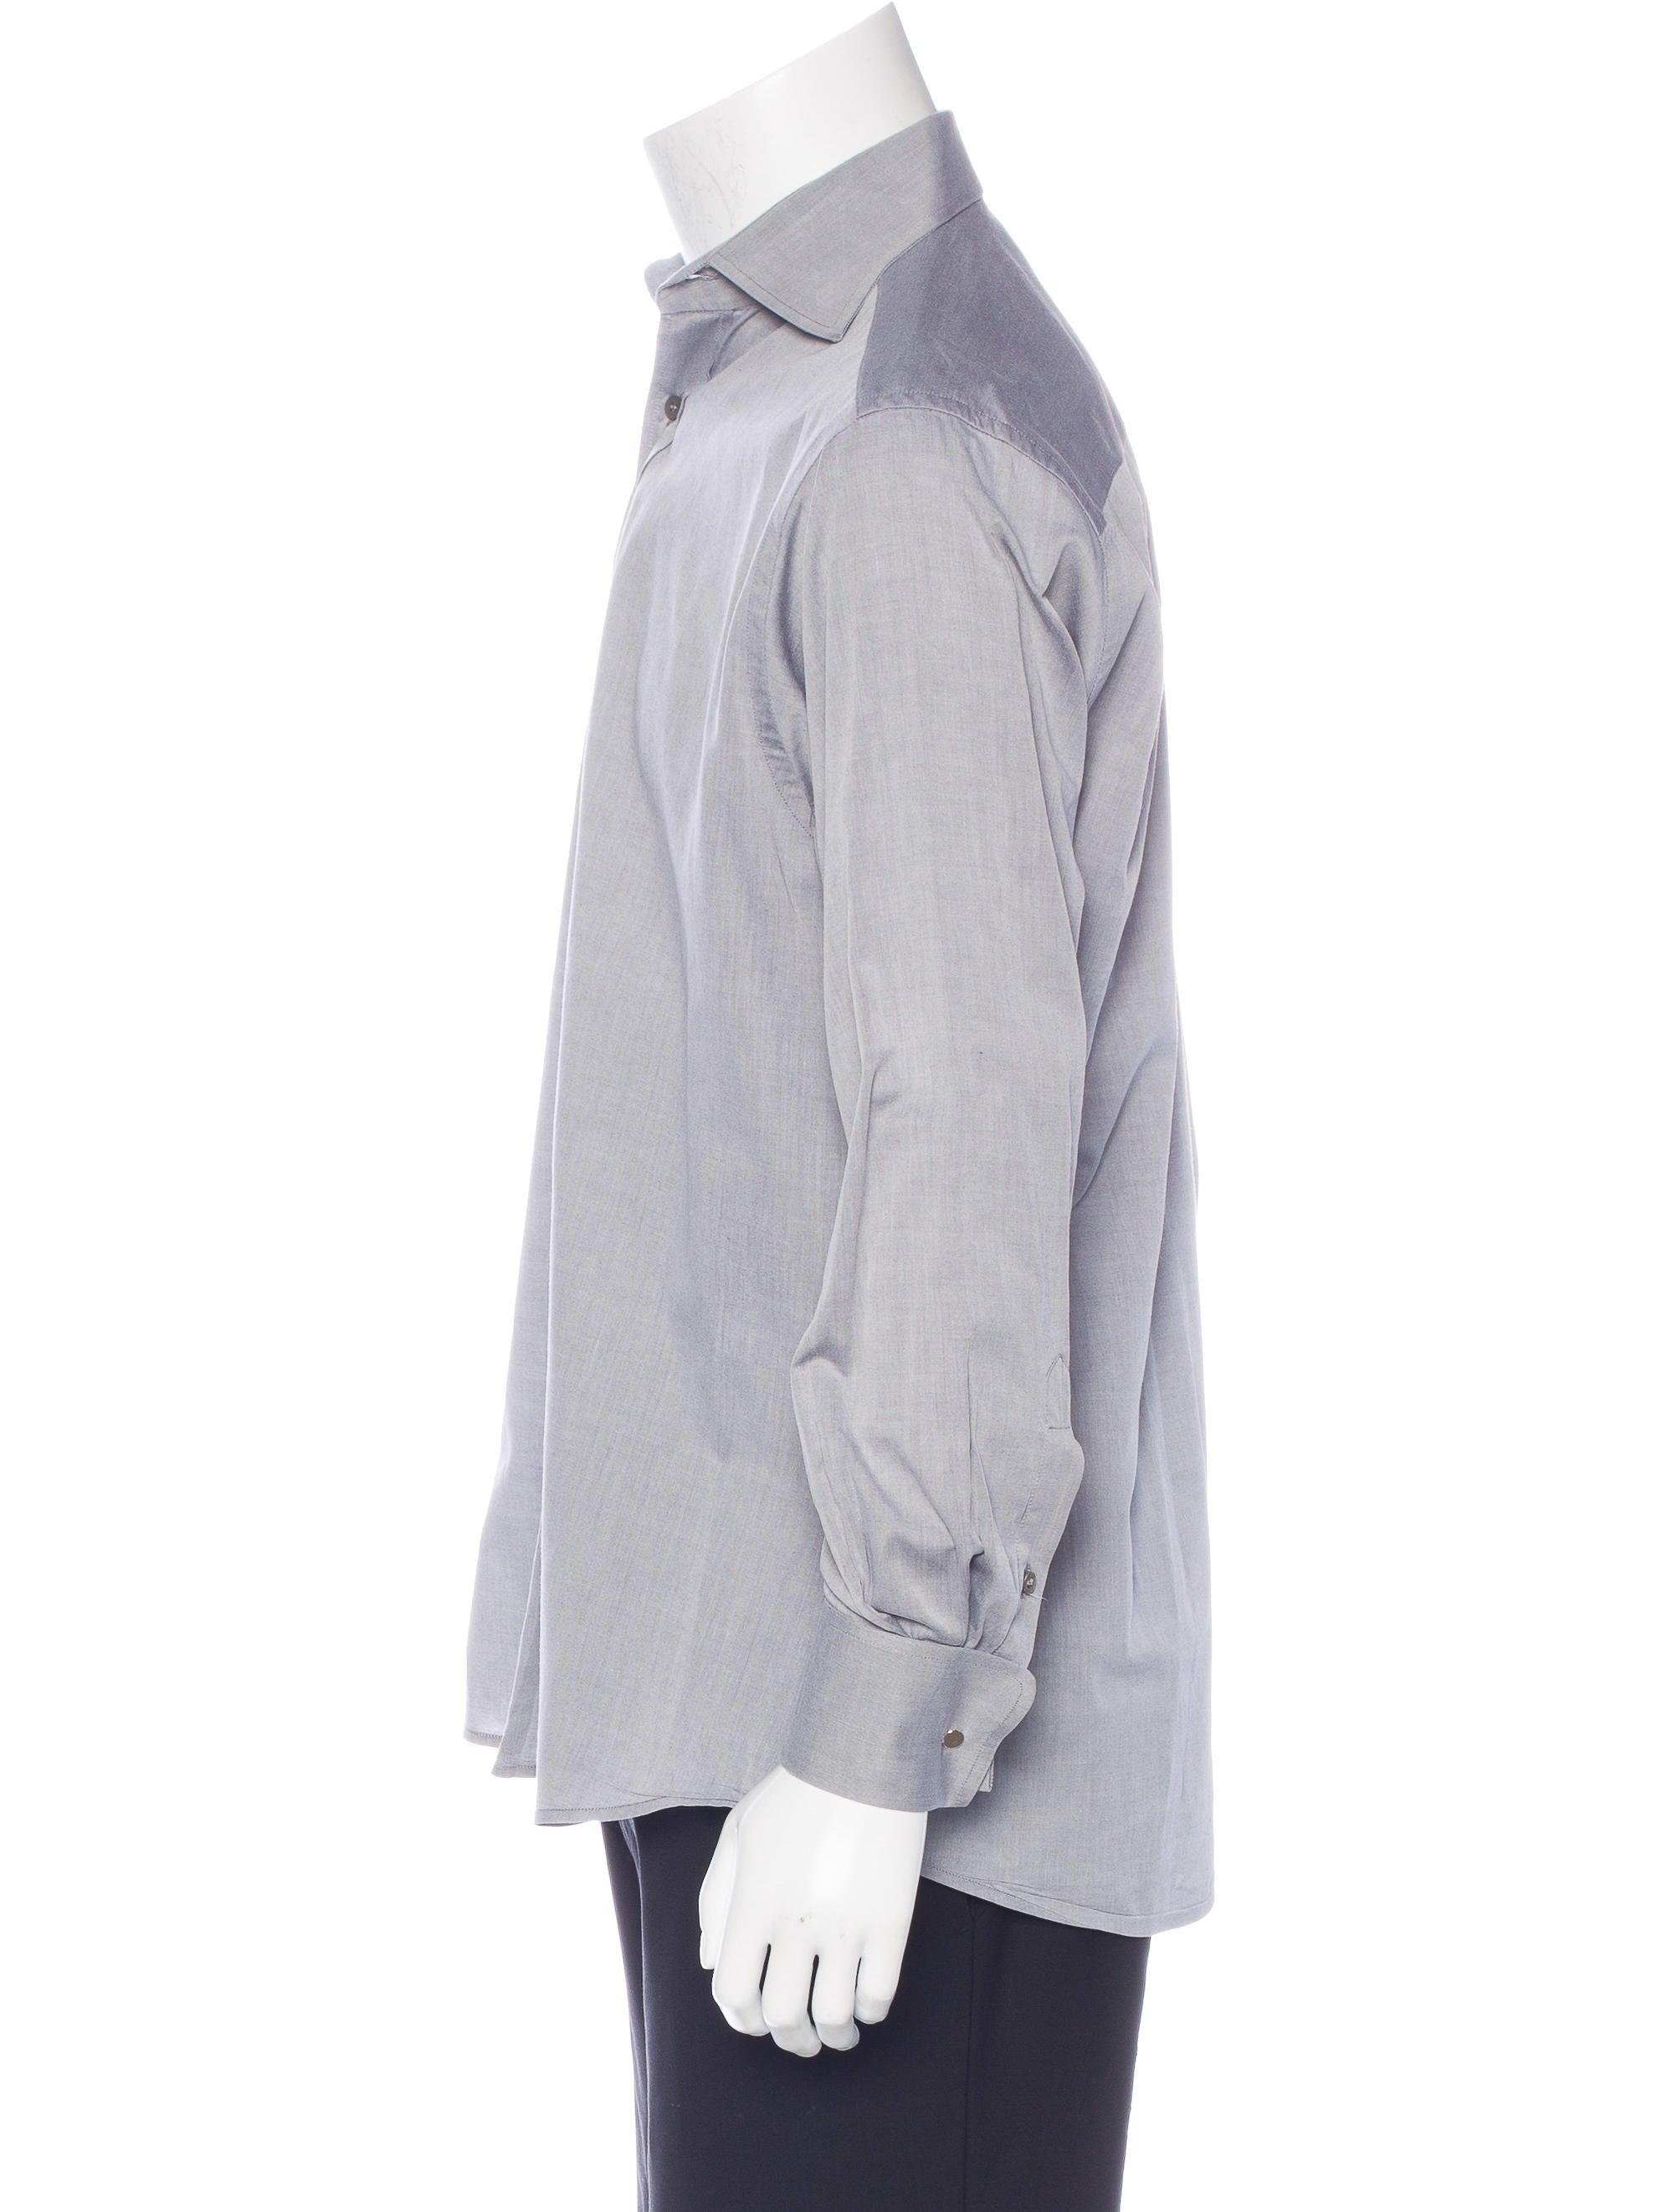 Gucci French Cuff Dress Shirt Clothing Guc153576 The